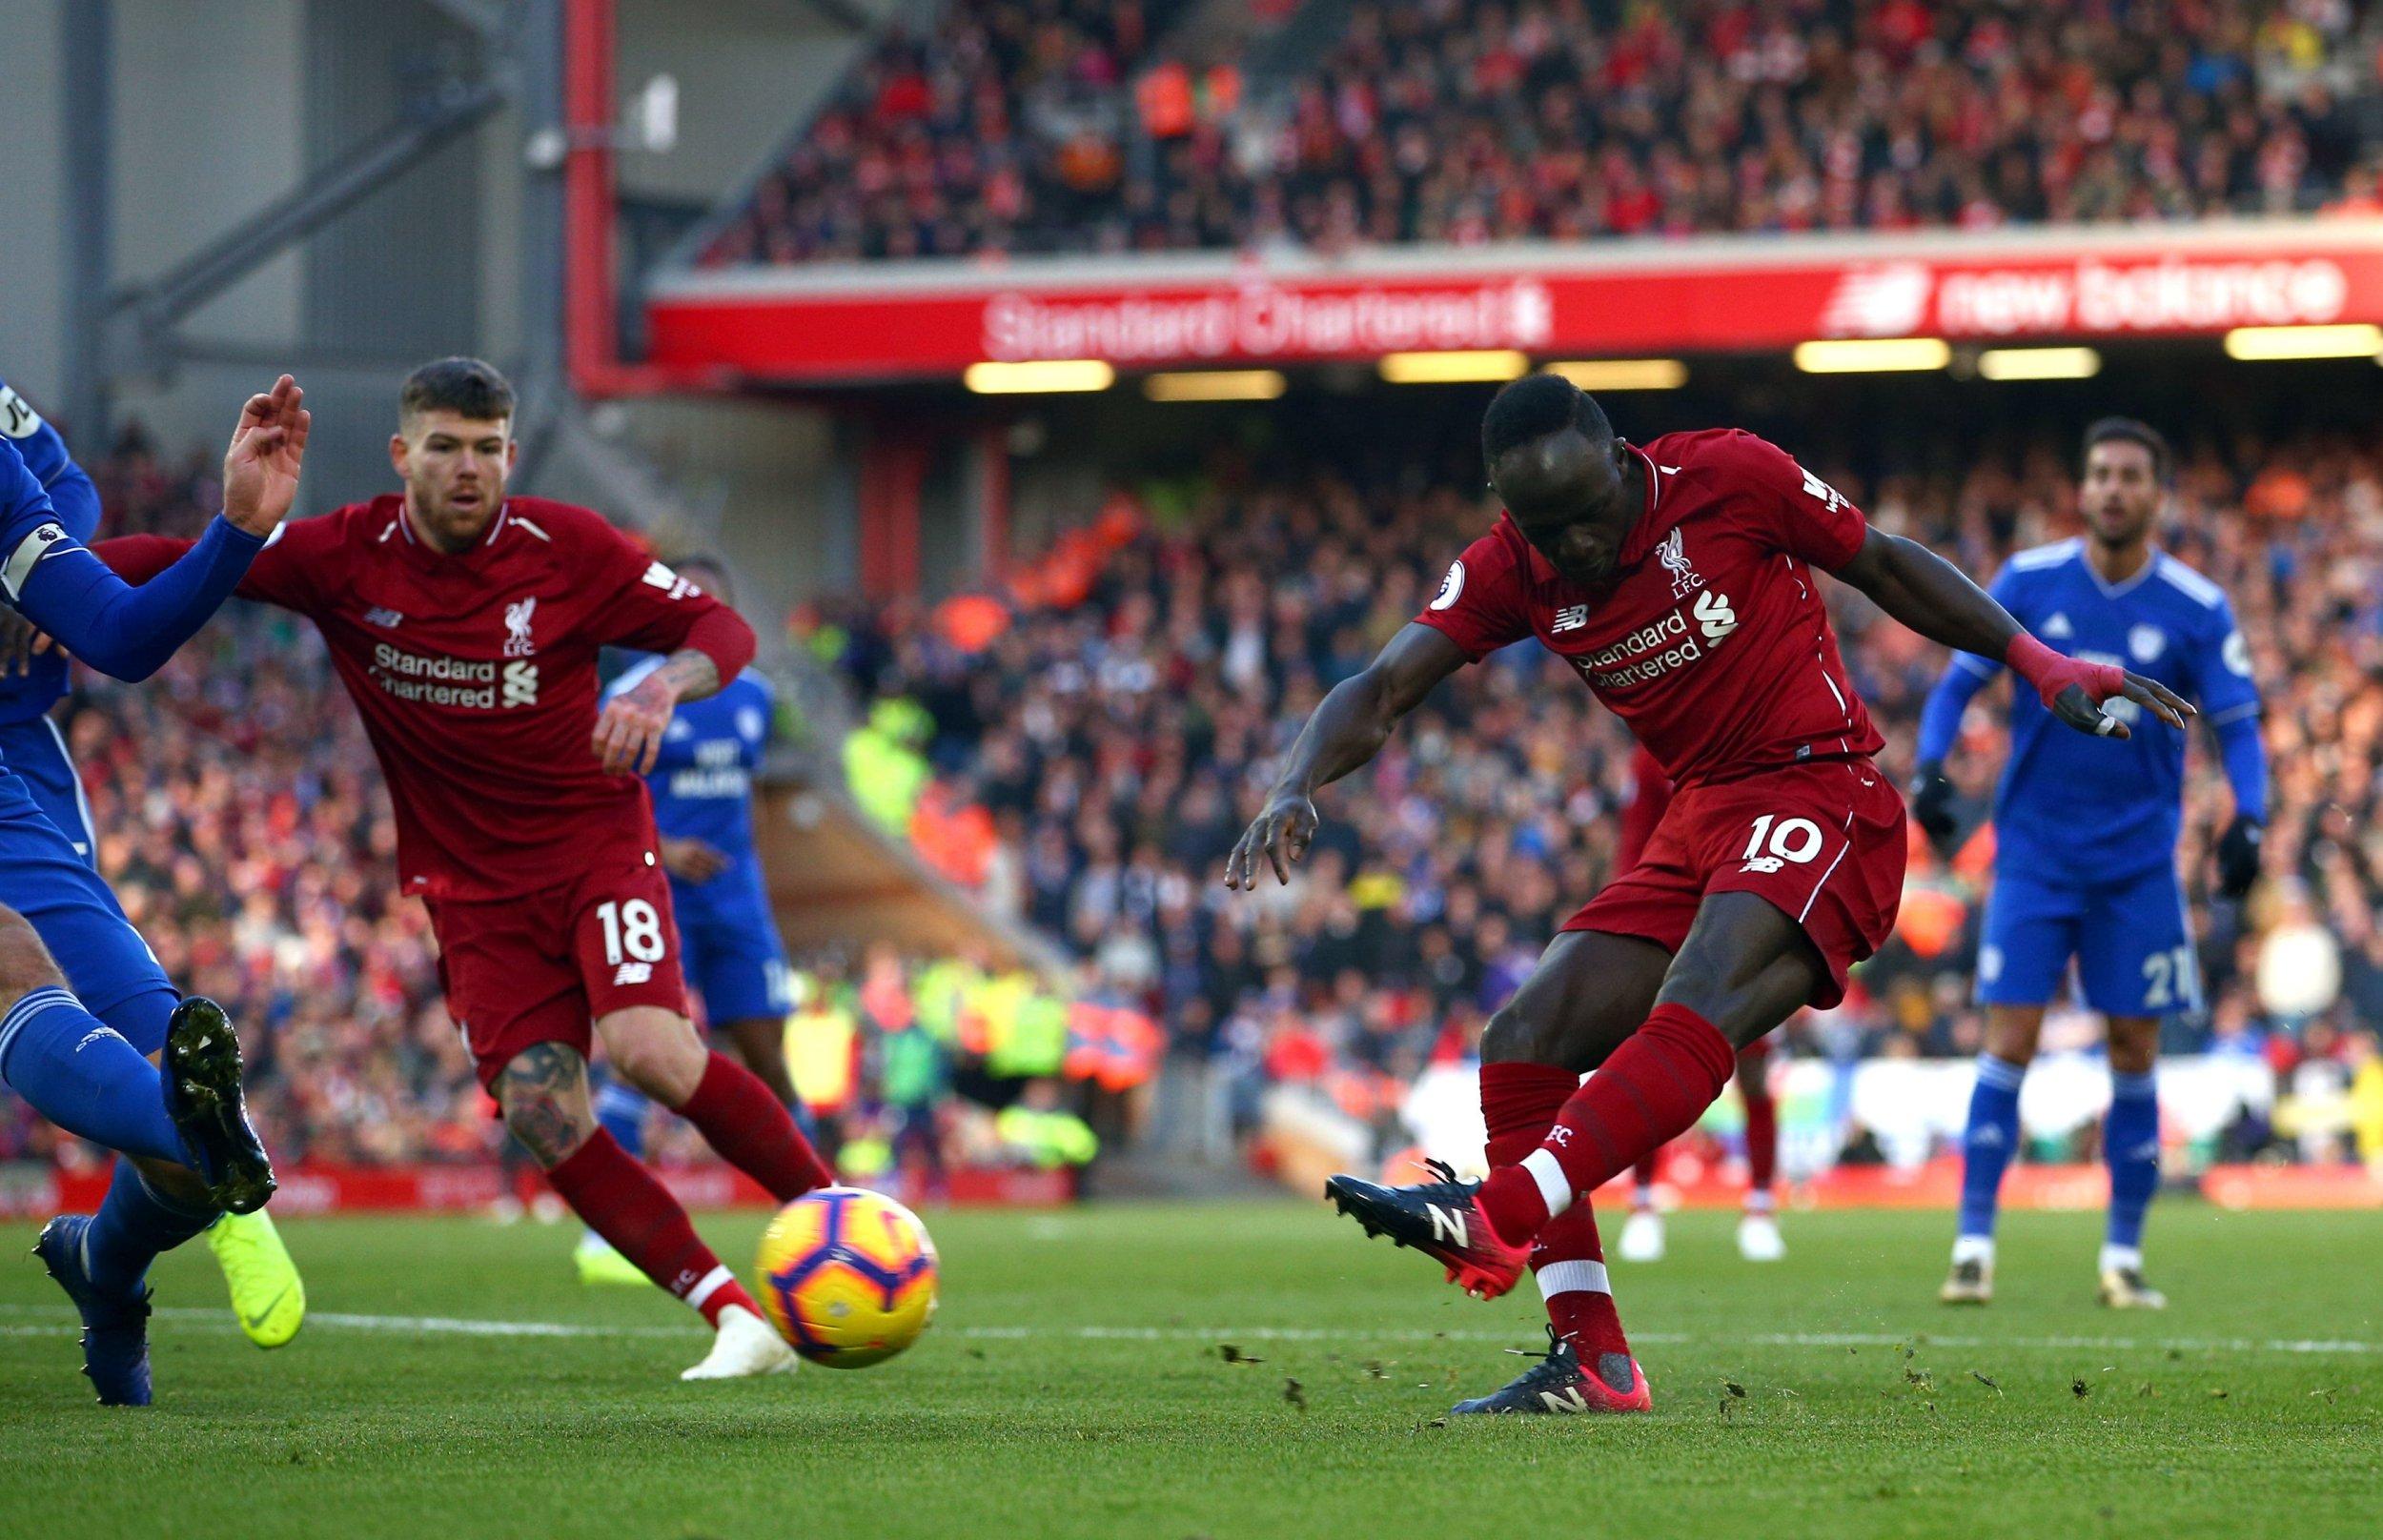 soi-keo-ca-cuoc-bong-da-ngay-21-4-slavia-praha-vs-Liverpool-cong-pha-phao-dai-b9 2